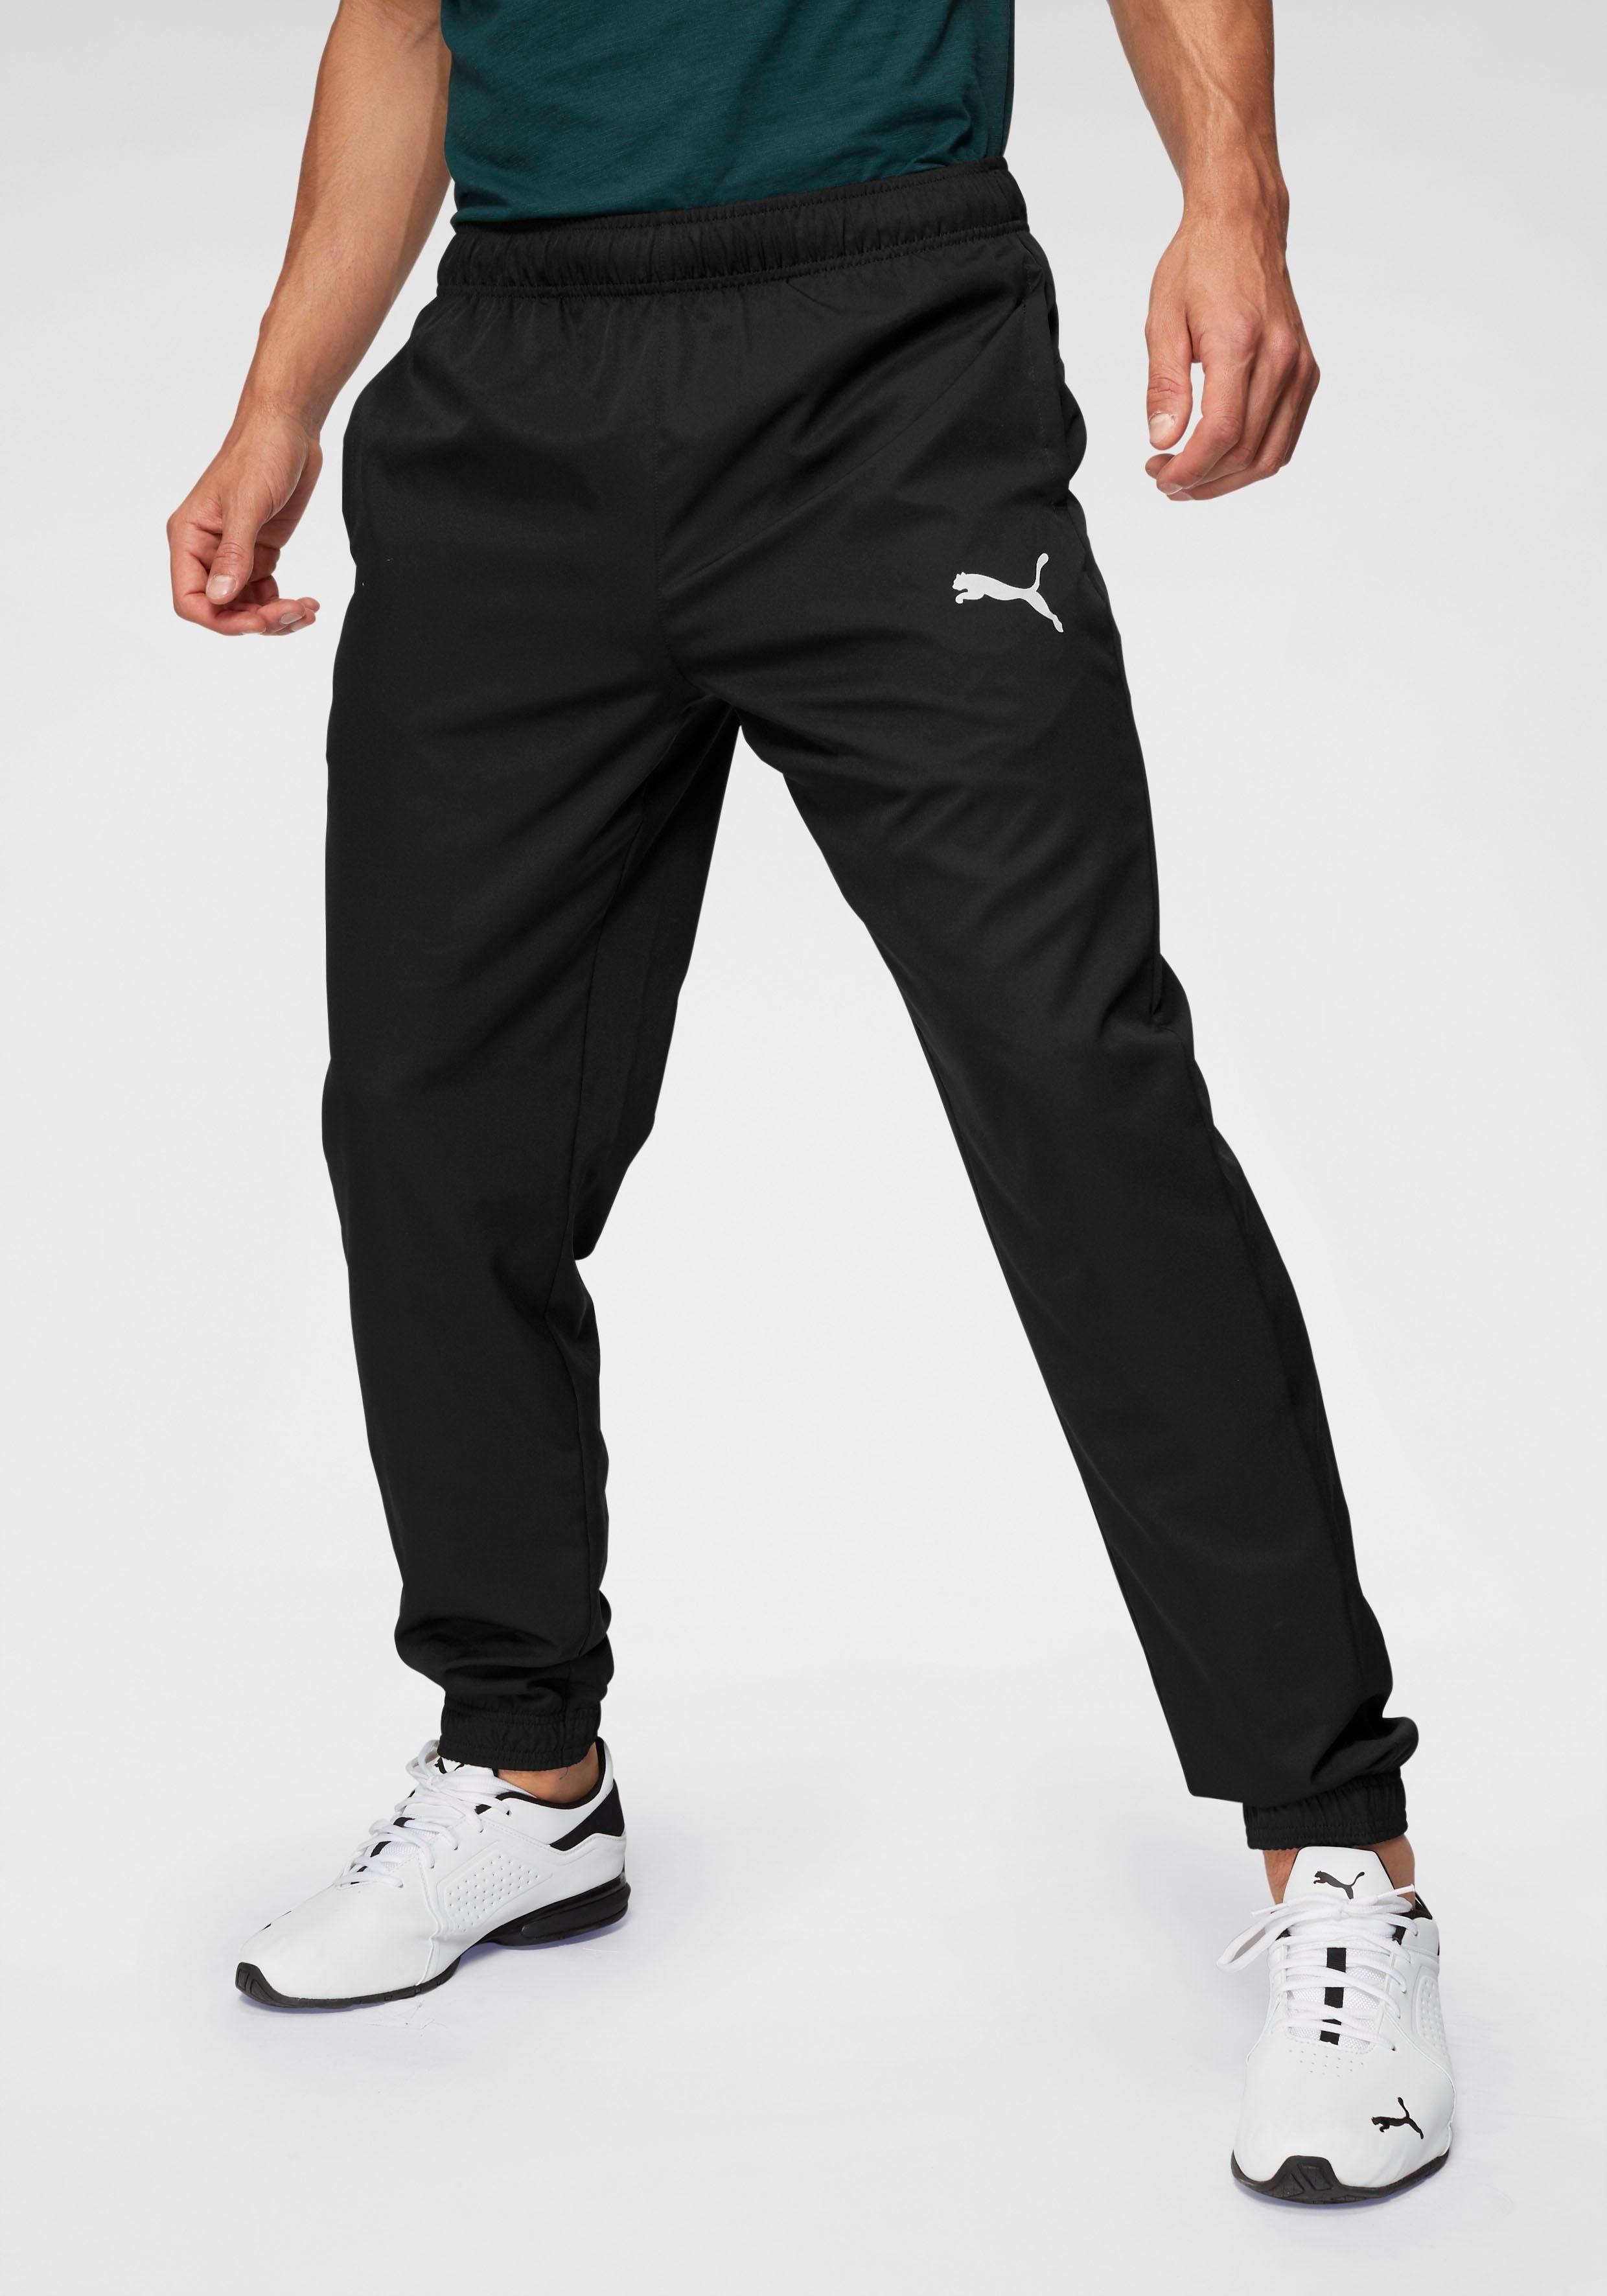 PUMA Sporthose »ACTIVE WOVEN PANTS CL« kaufen | OTTO